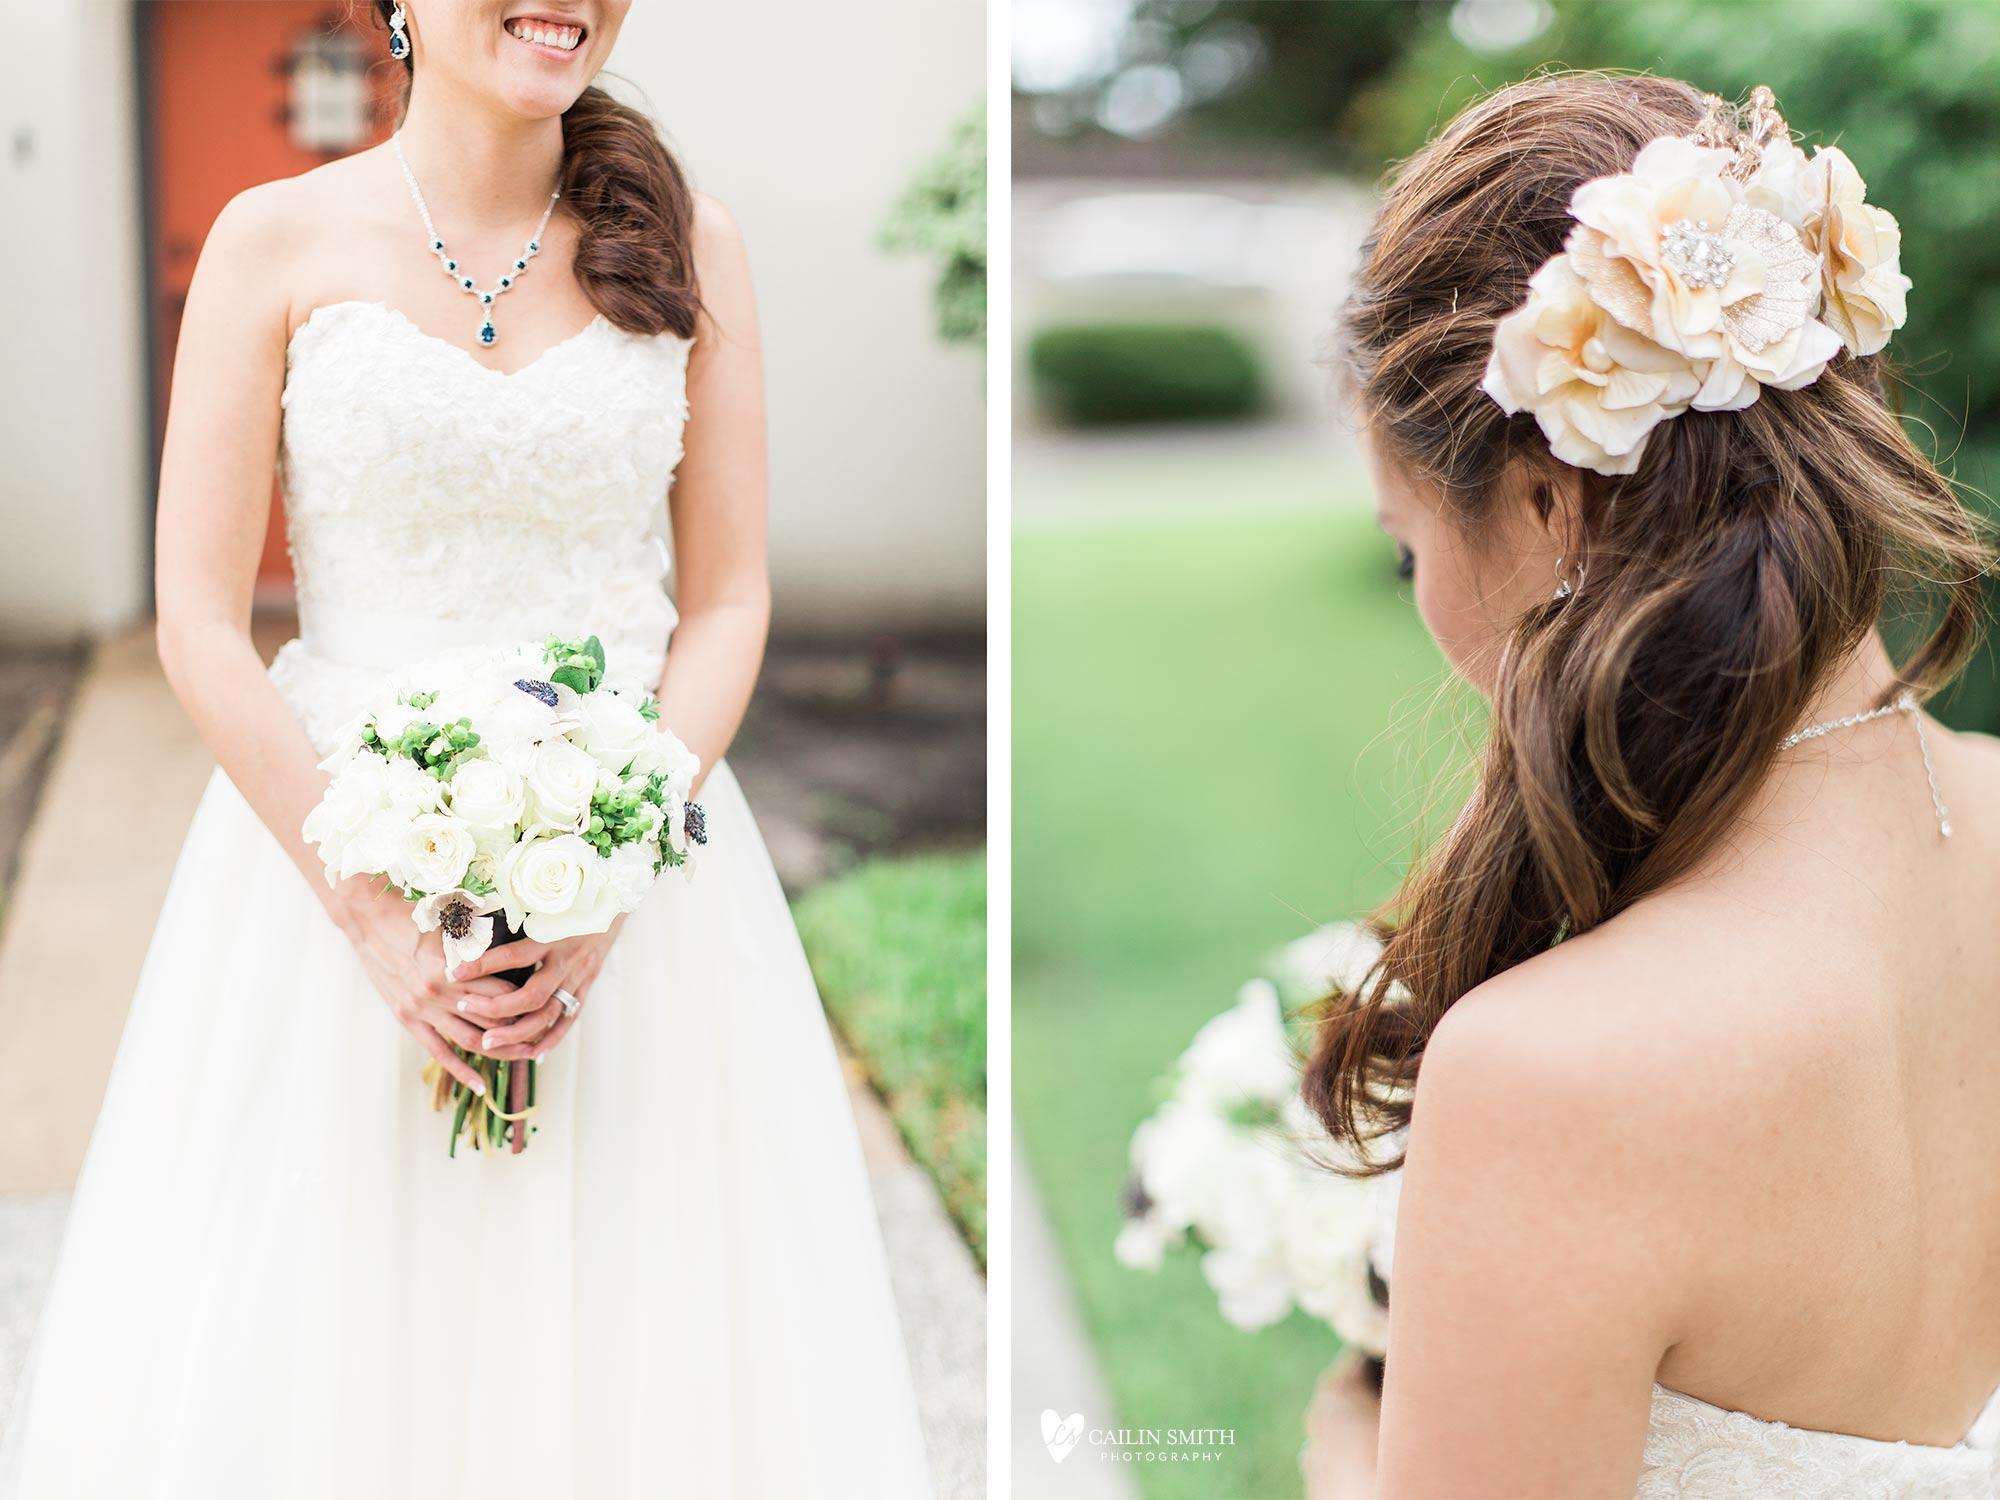 Jenifer_Dewey_Treasury_on_The_Plaza_Wedding_Photography_079.jpg